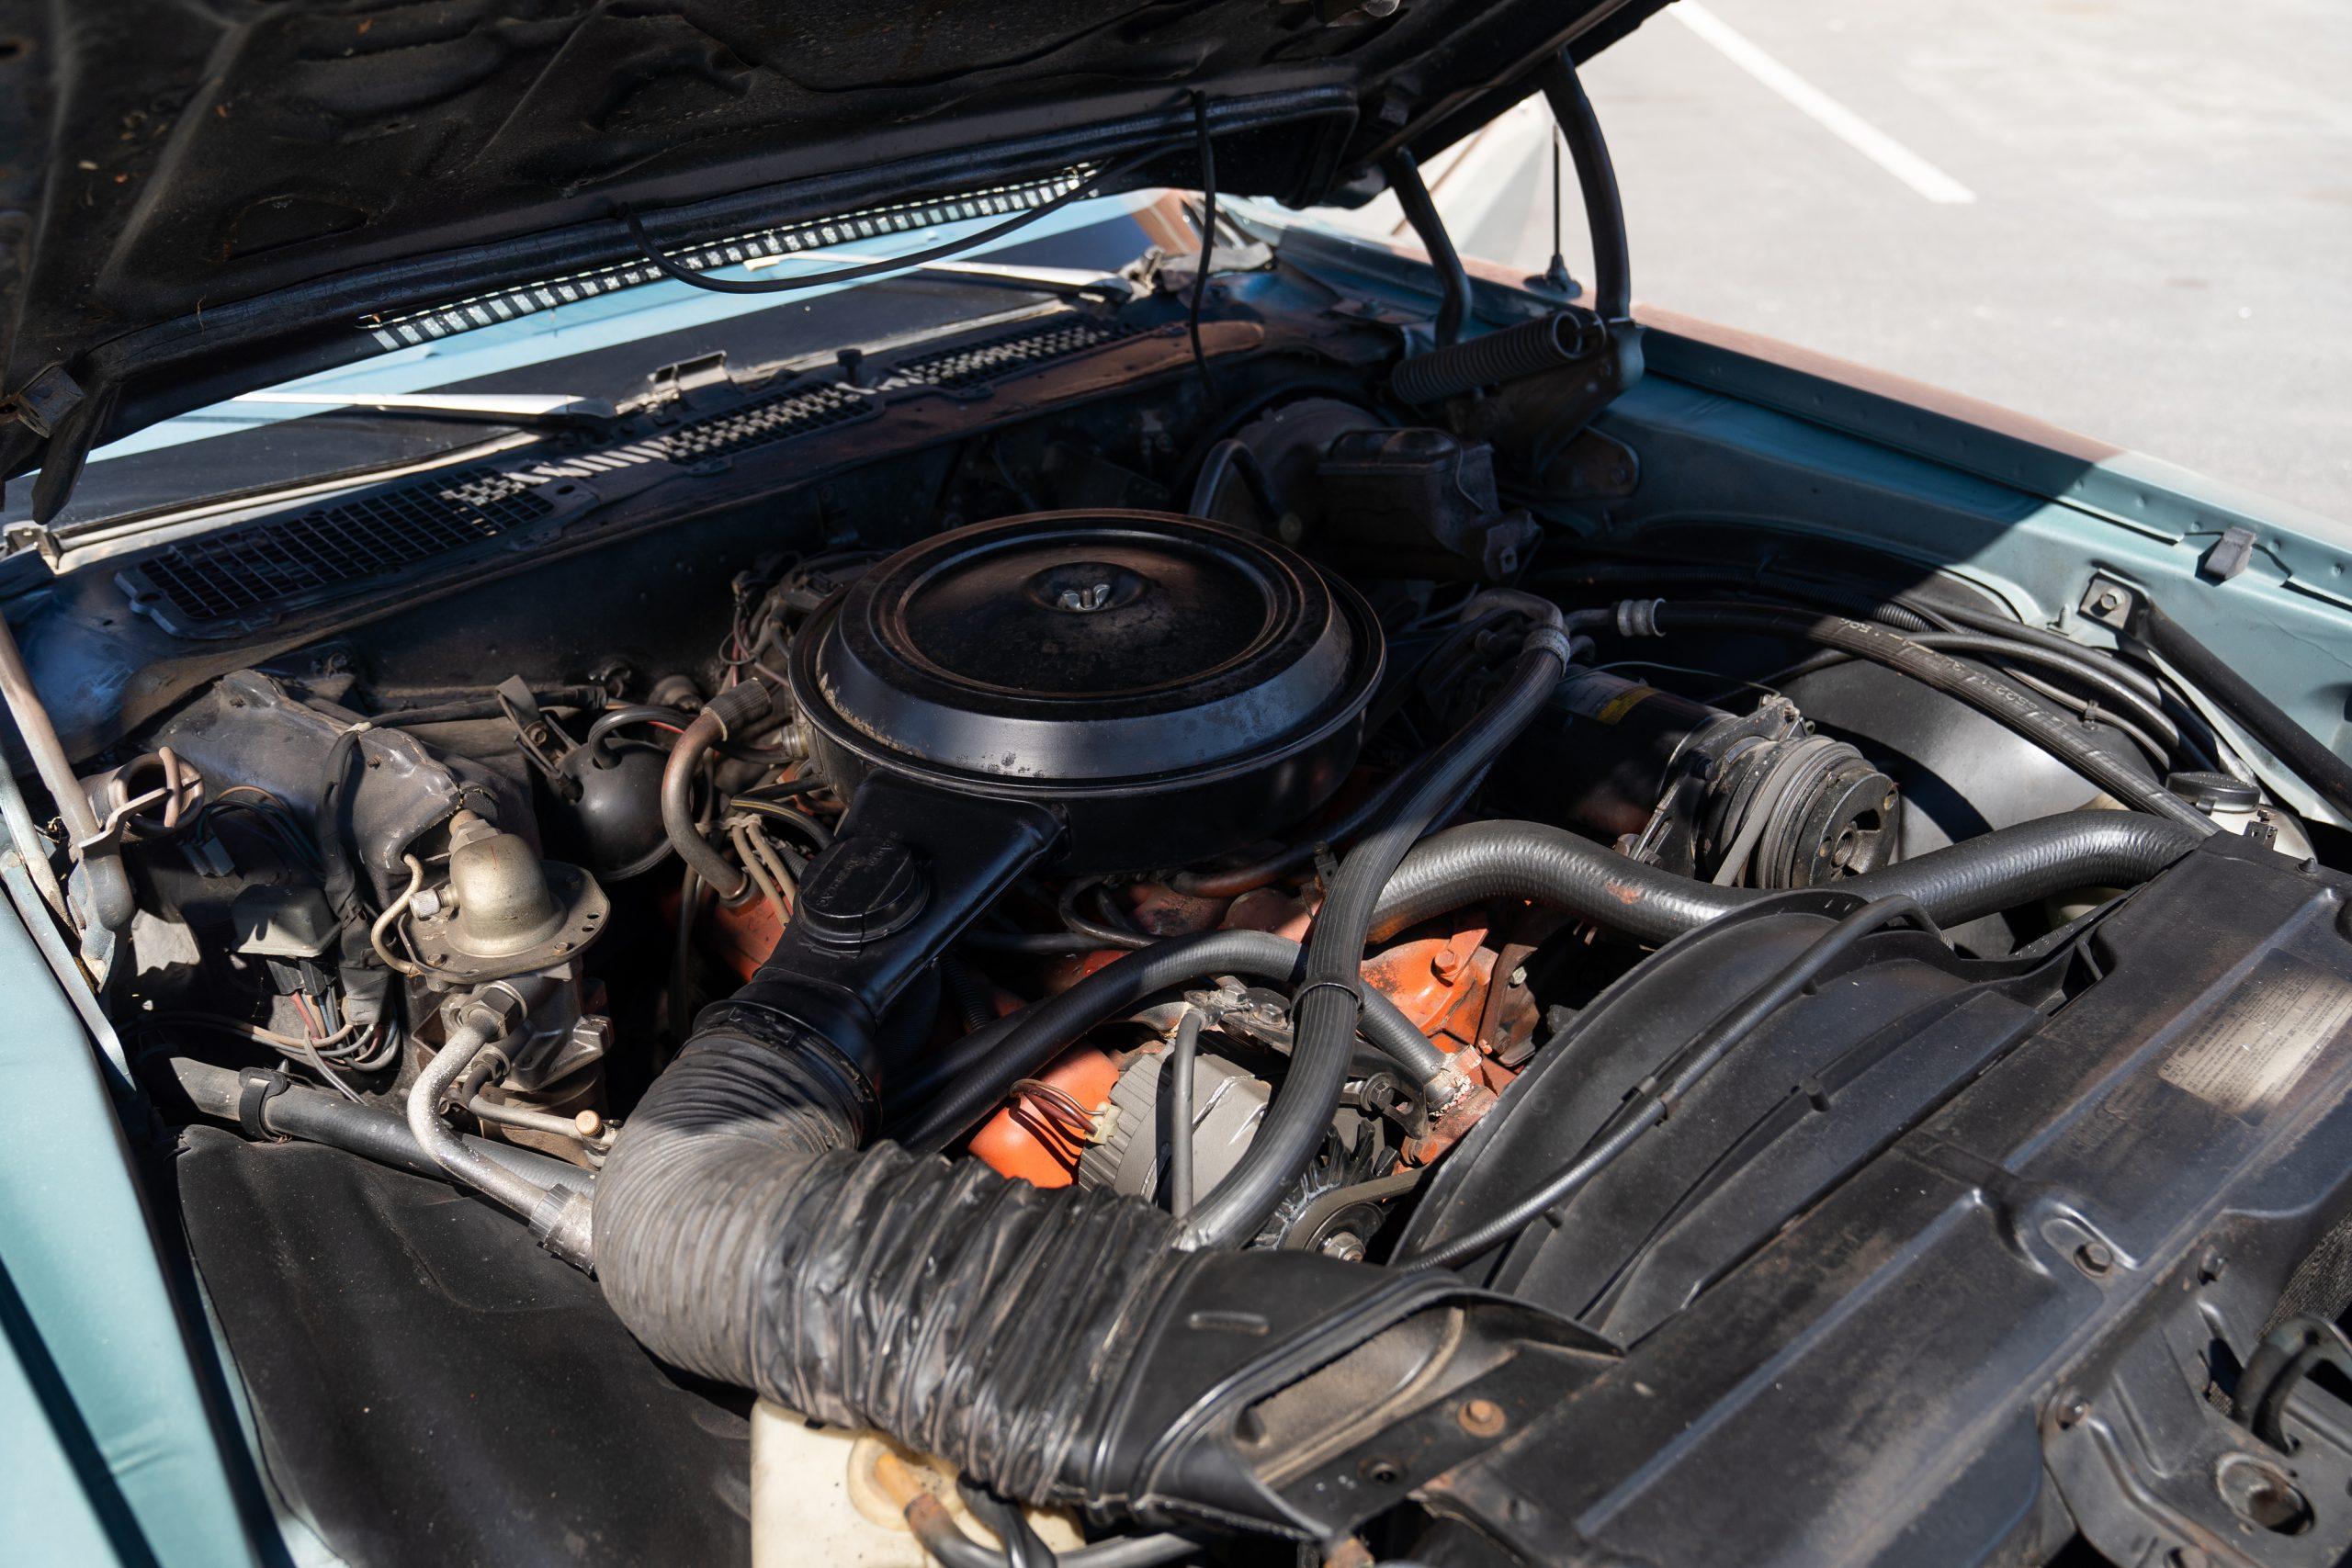 Europo Hurst engine angled